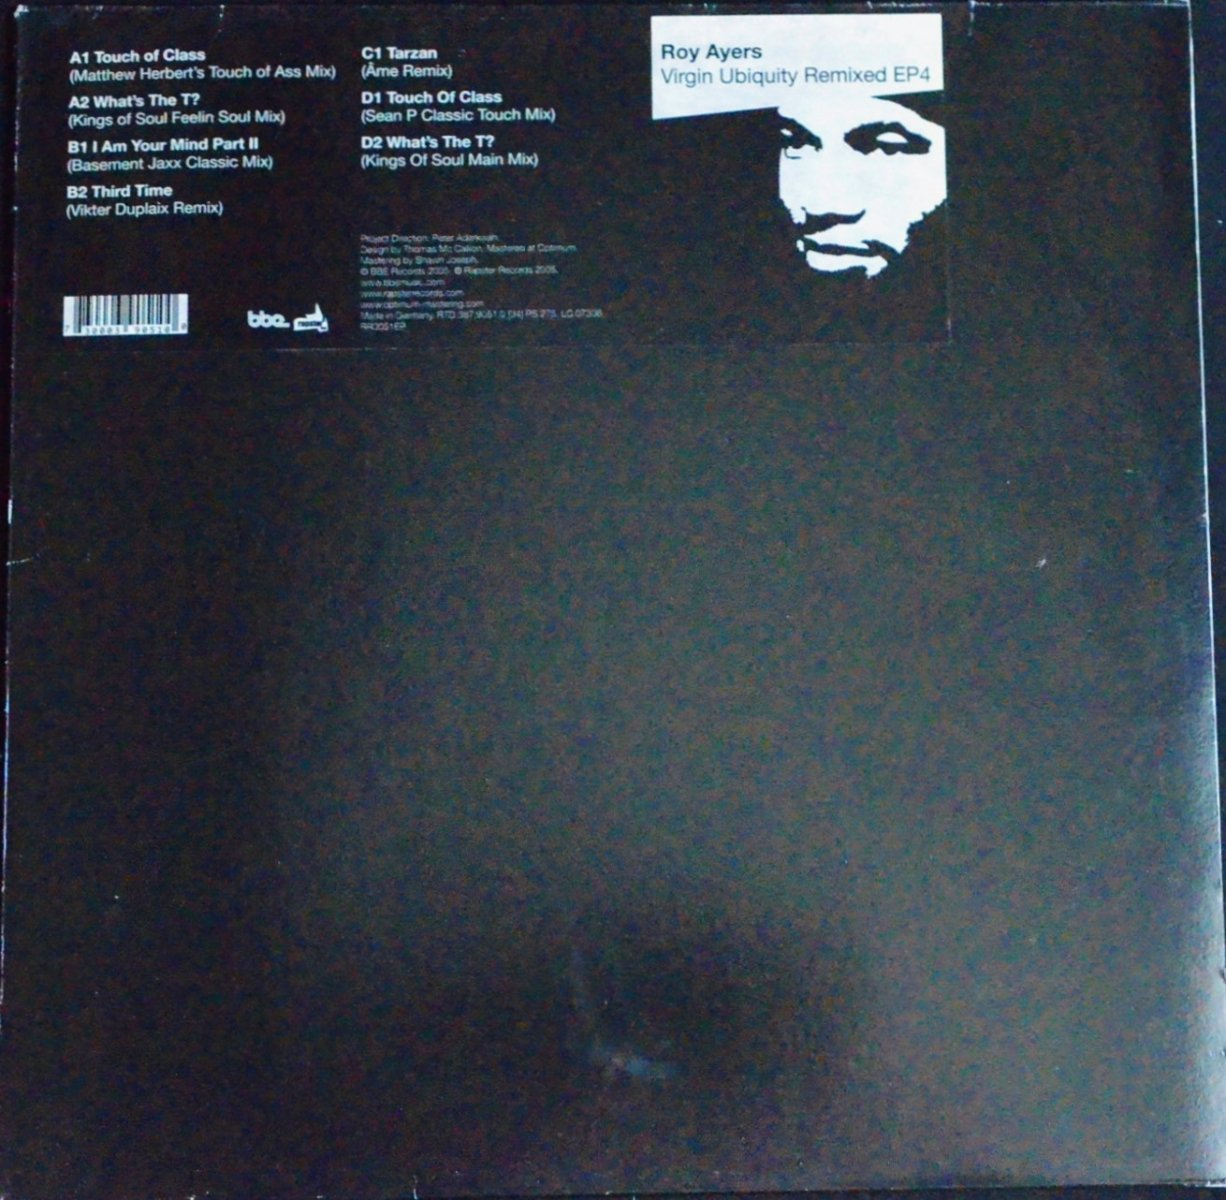 ROY AYERS / VIRGIN UBIQUITY REMIXED EP 4 (2×12